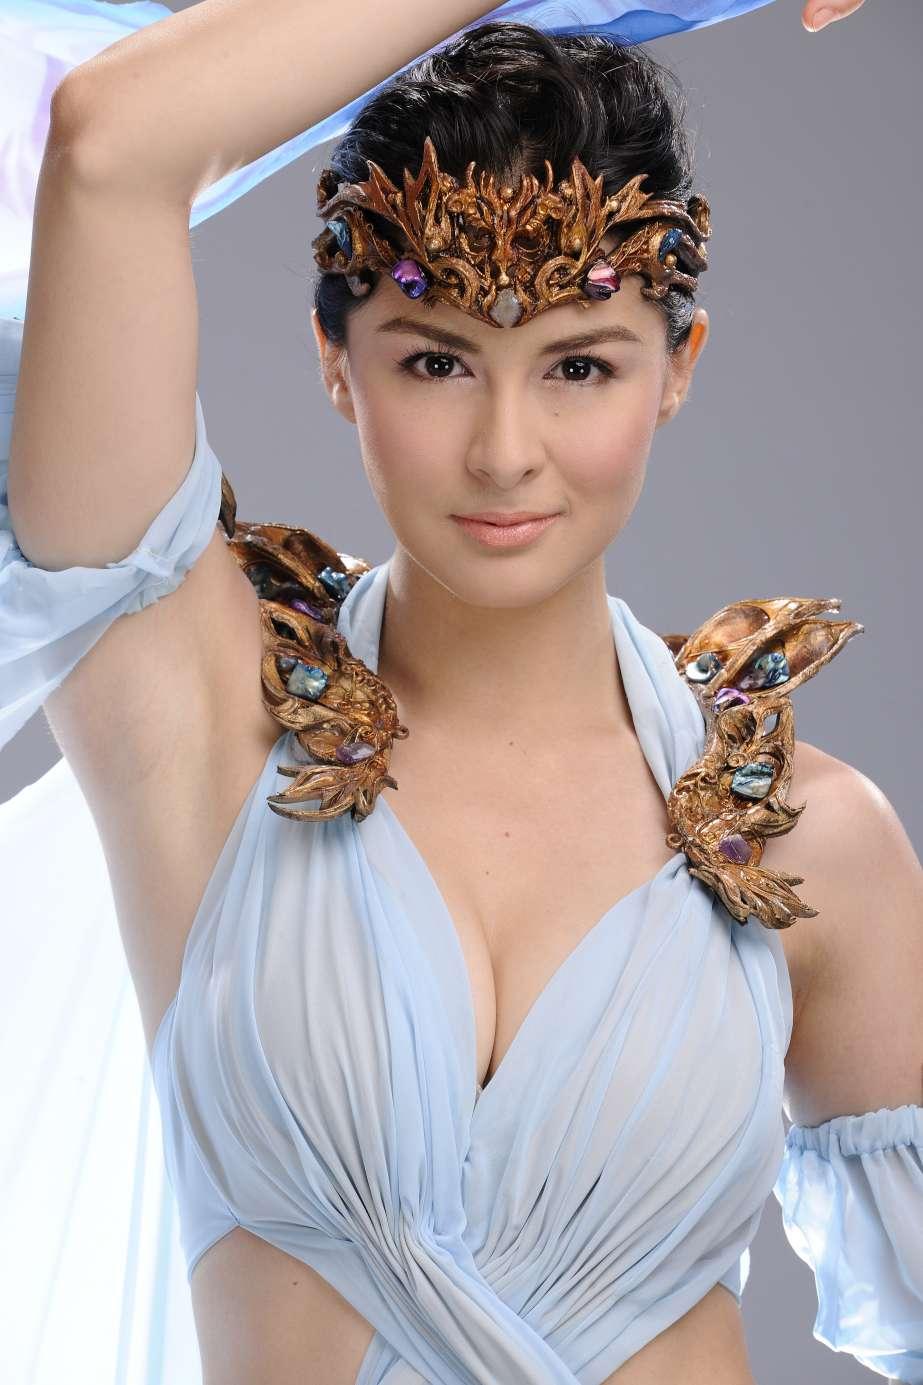 foto hot sexy marian rivera toket artis indonesia